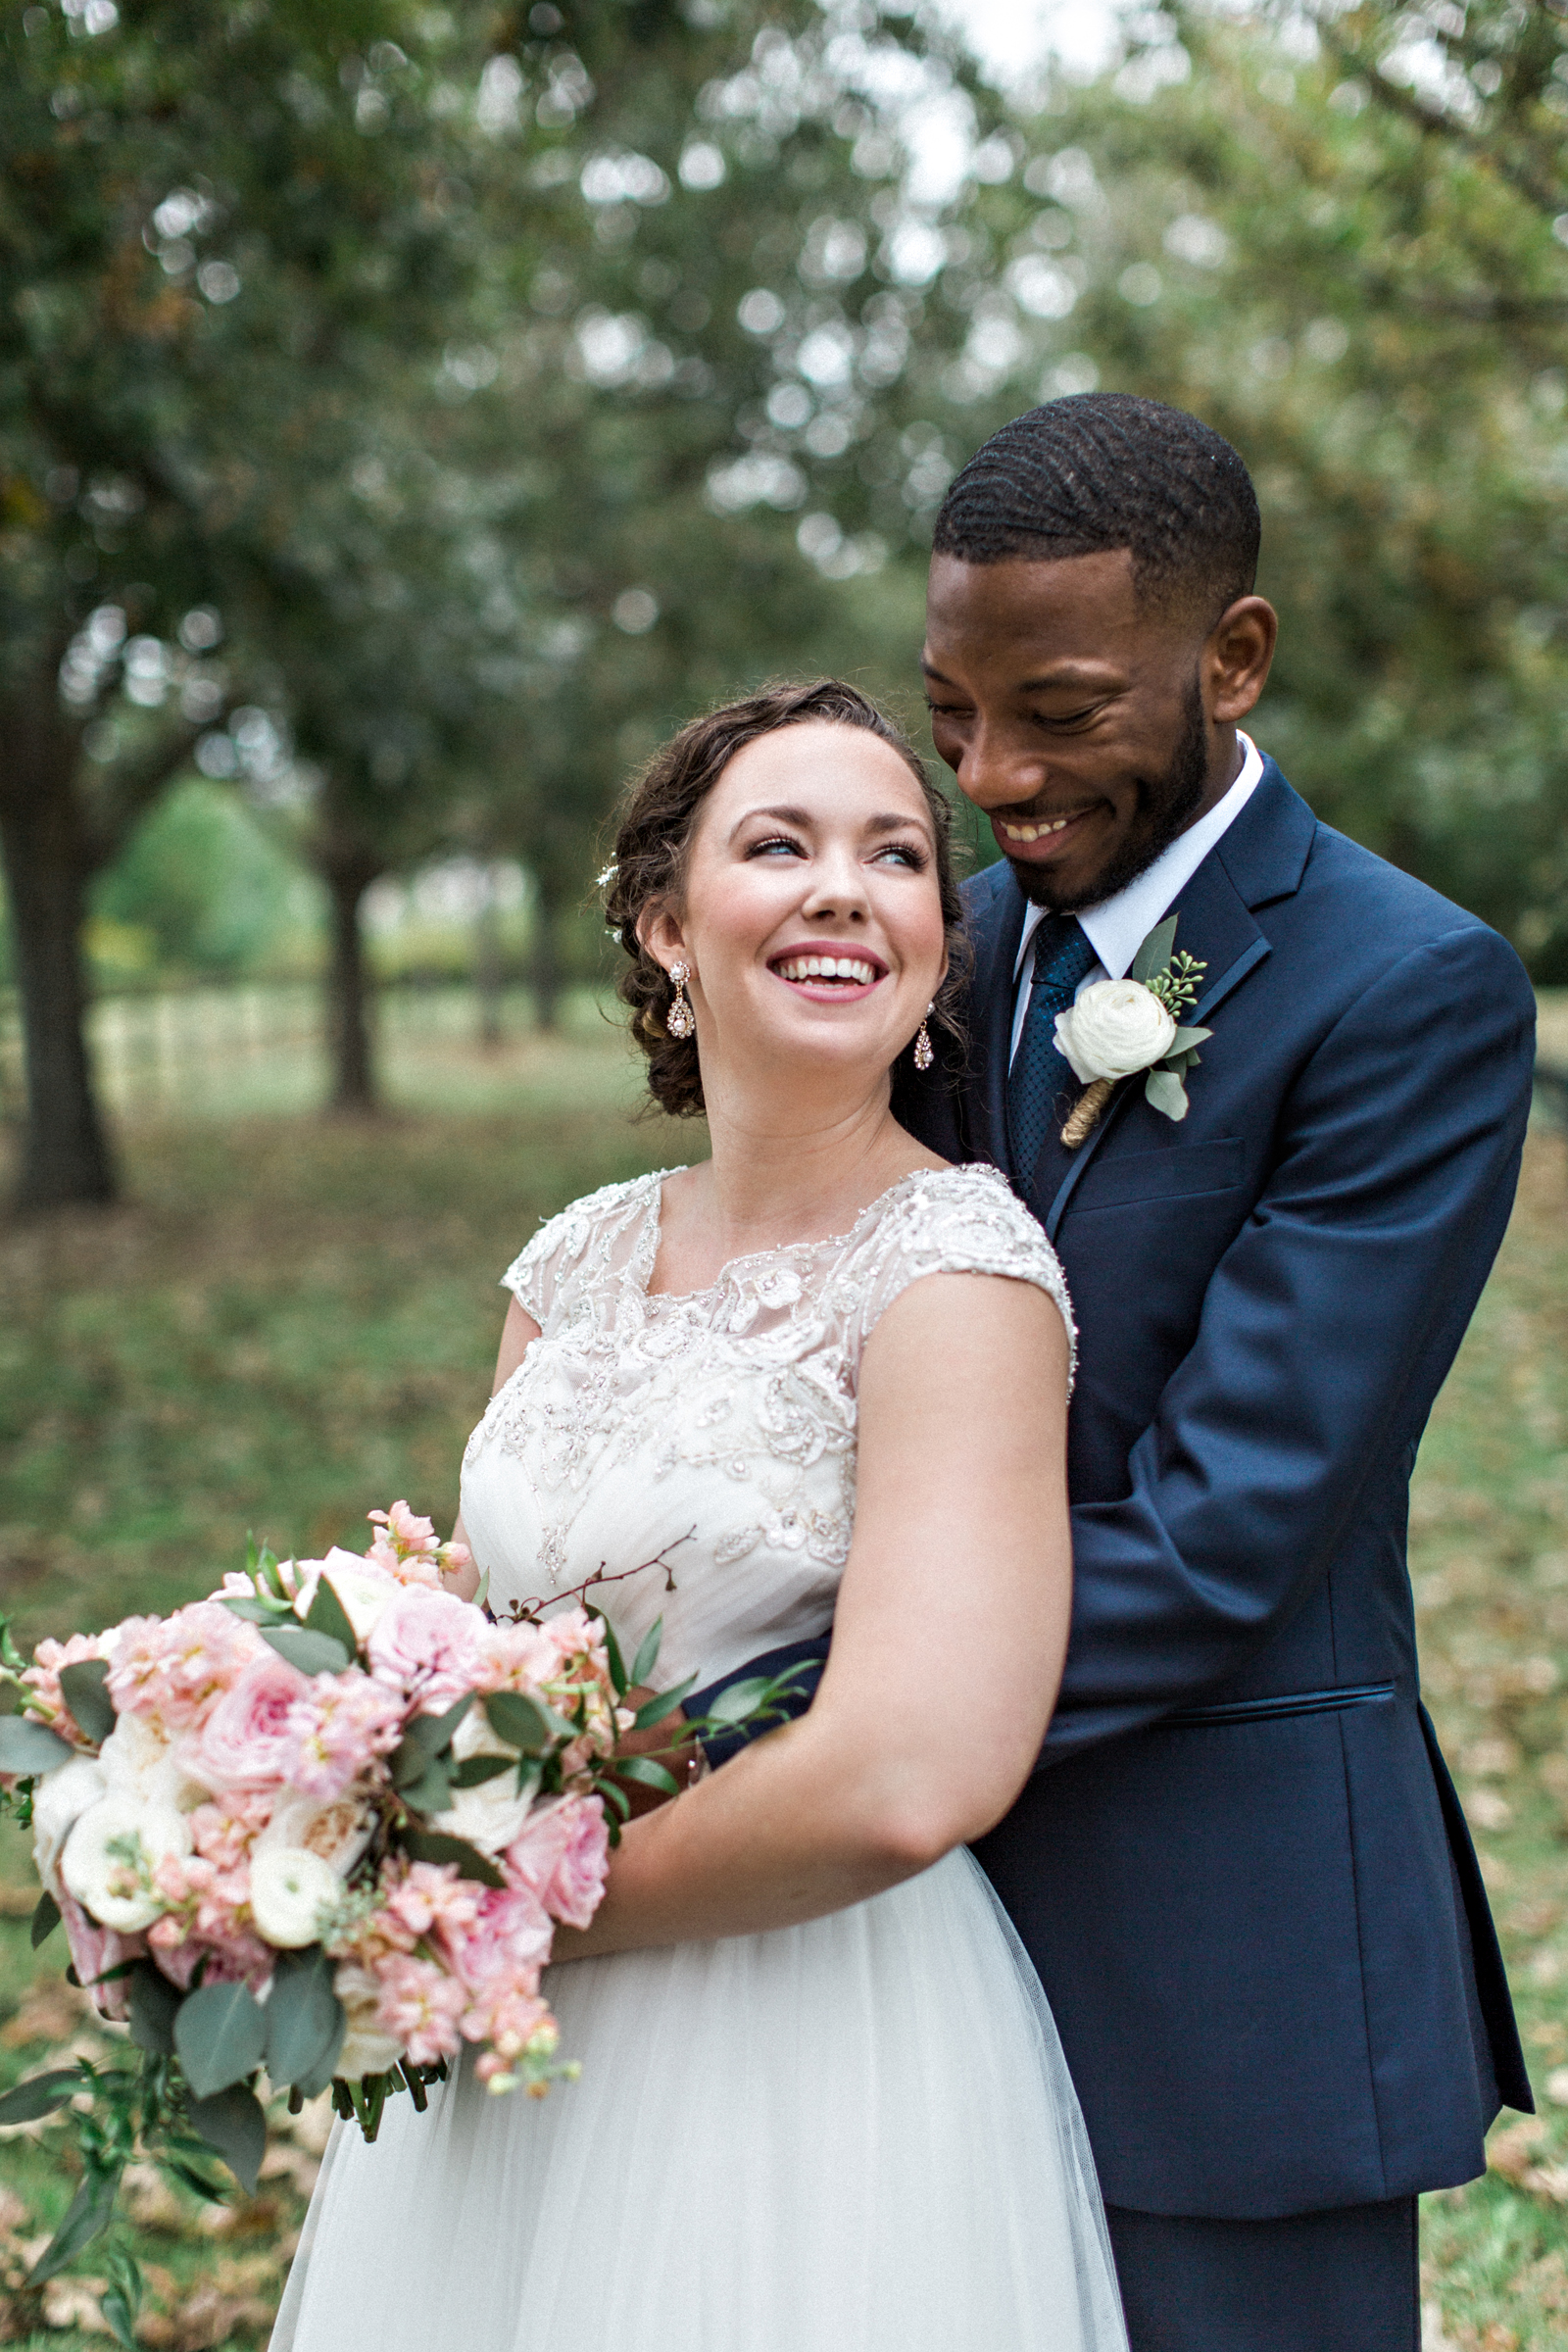 Alabama-Wedding-Photography-Nick-Drollette-Cory-Laura-129.jpg